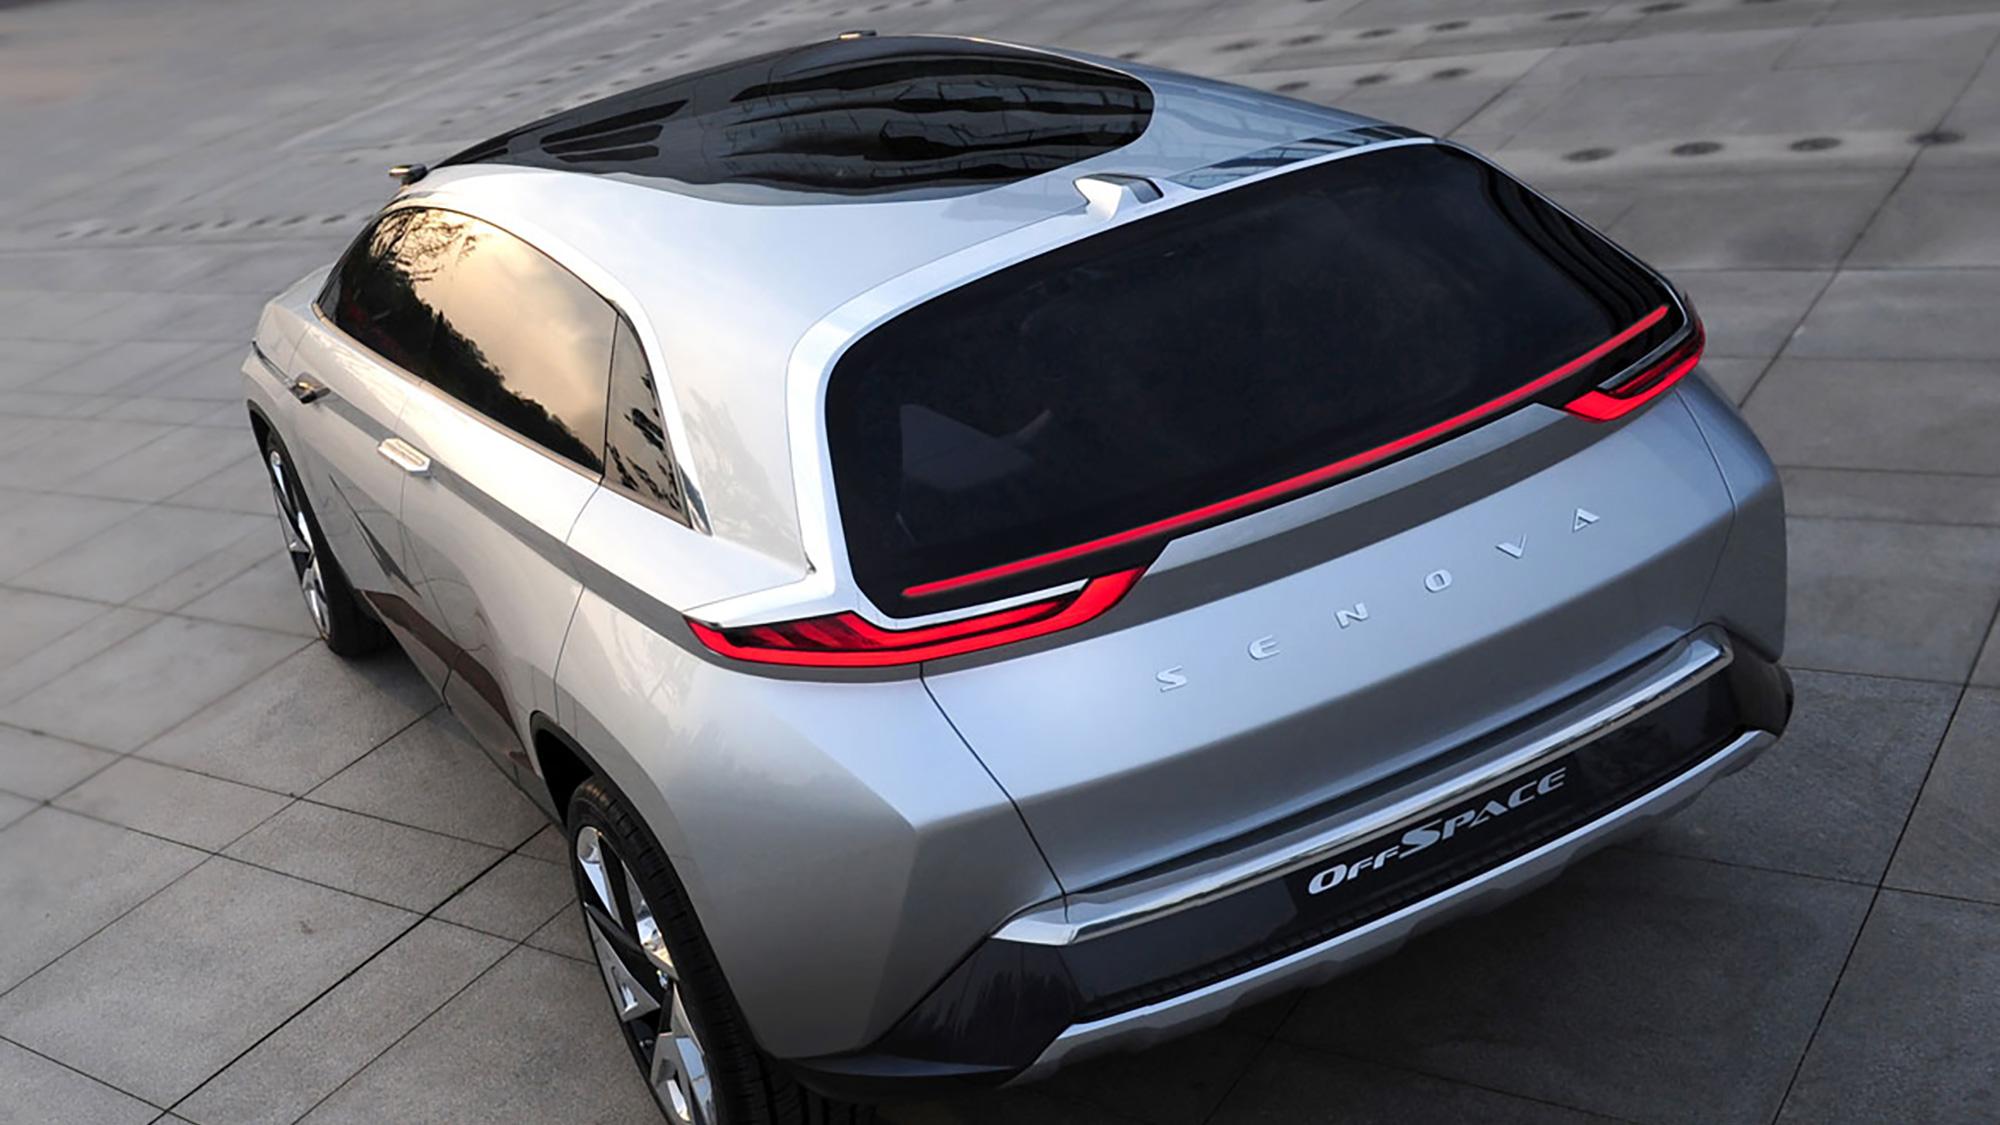 Senova OffSpace - Defining the next generation SUV